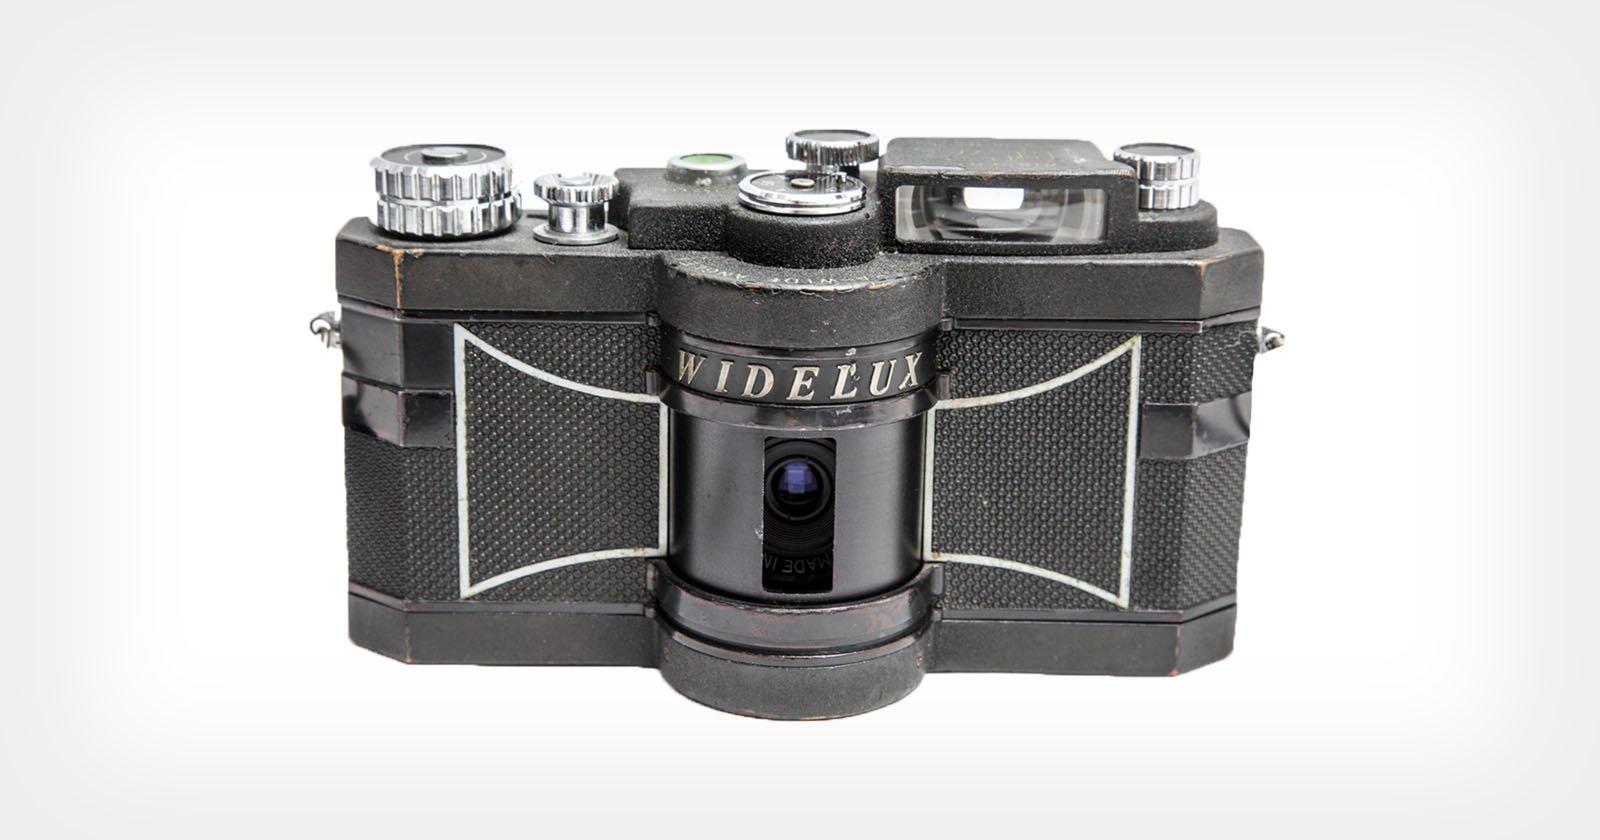 La meravigliosa telecamera panoramica Widelux: Love Affair di Jeff Bridge